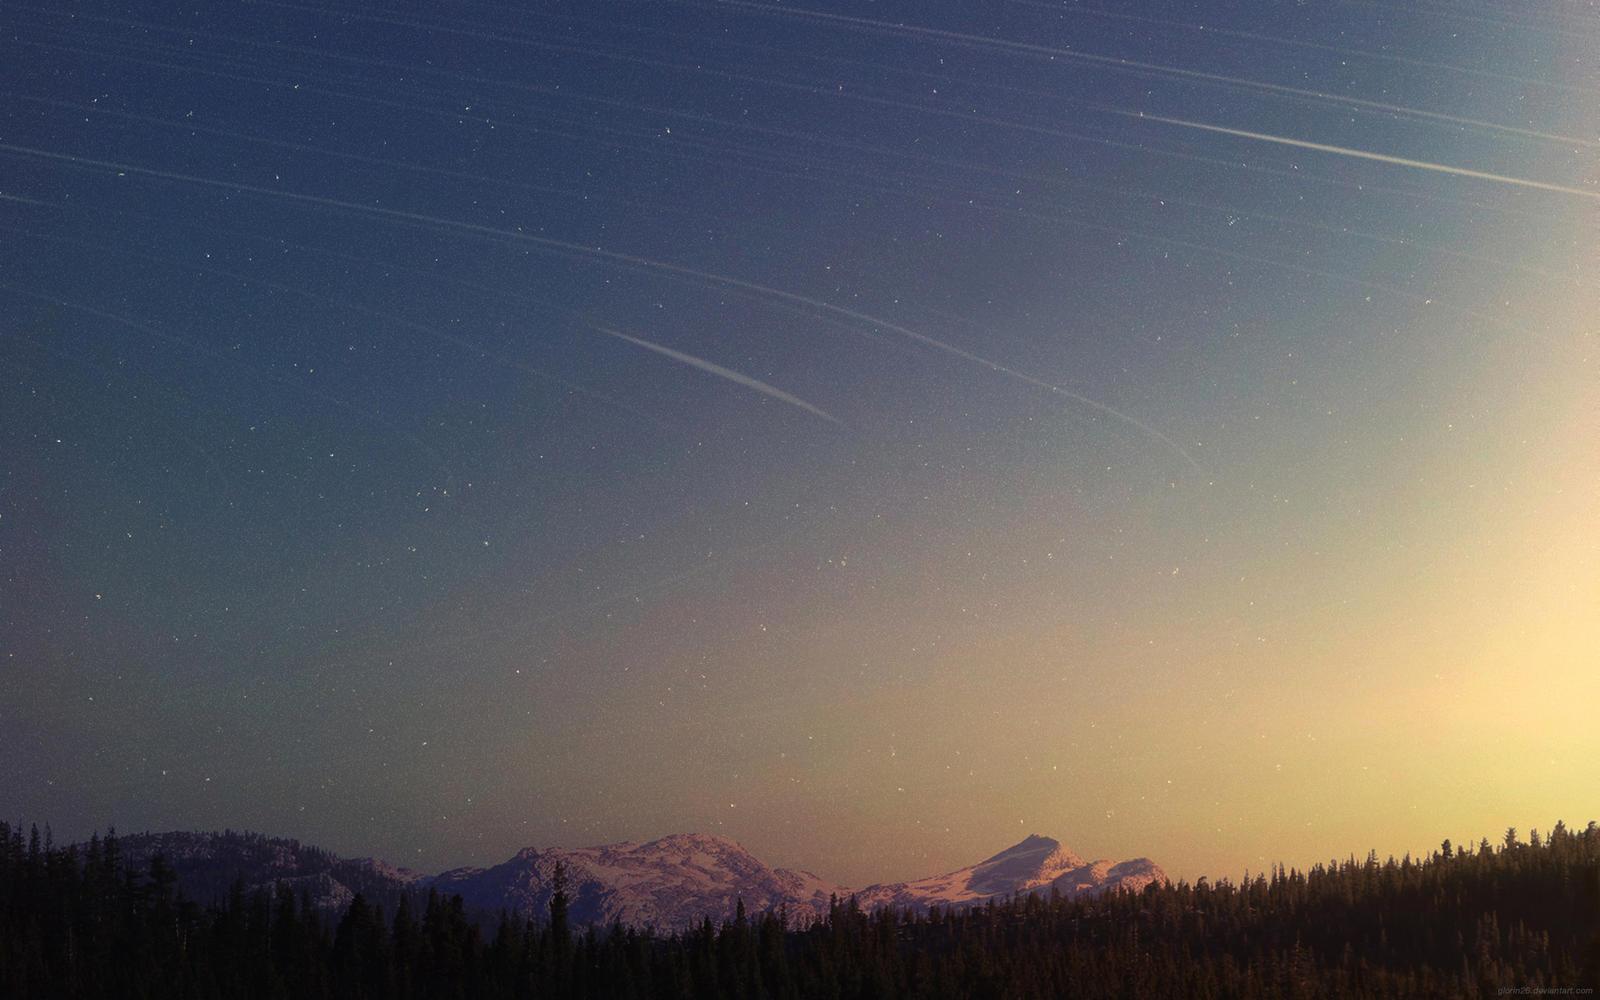 *Wild Night by GLoRin26